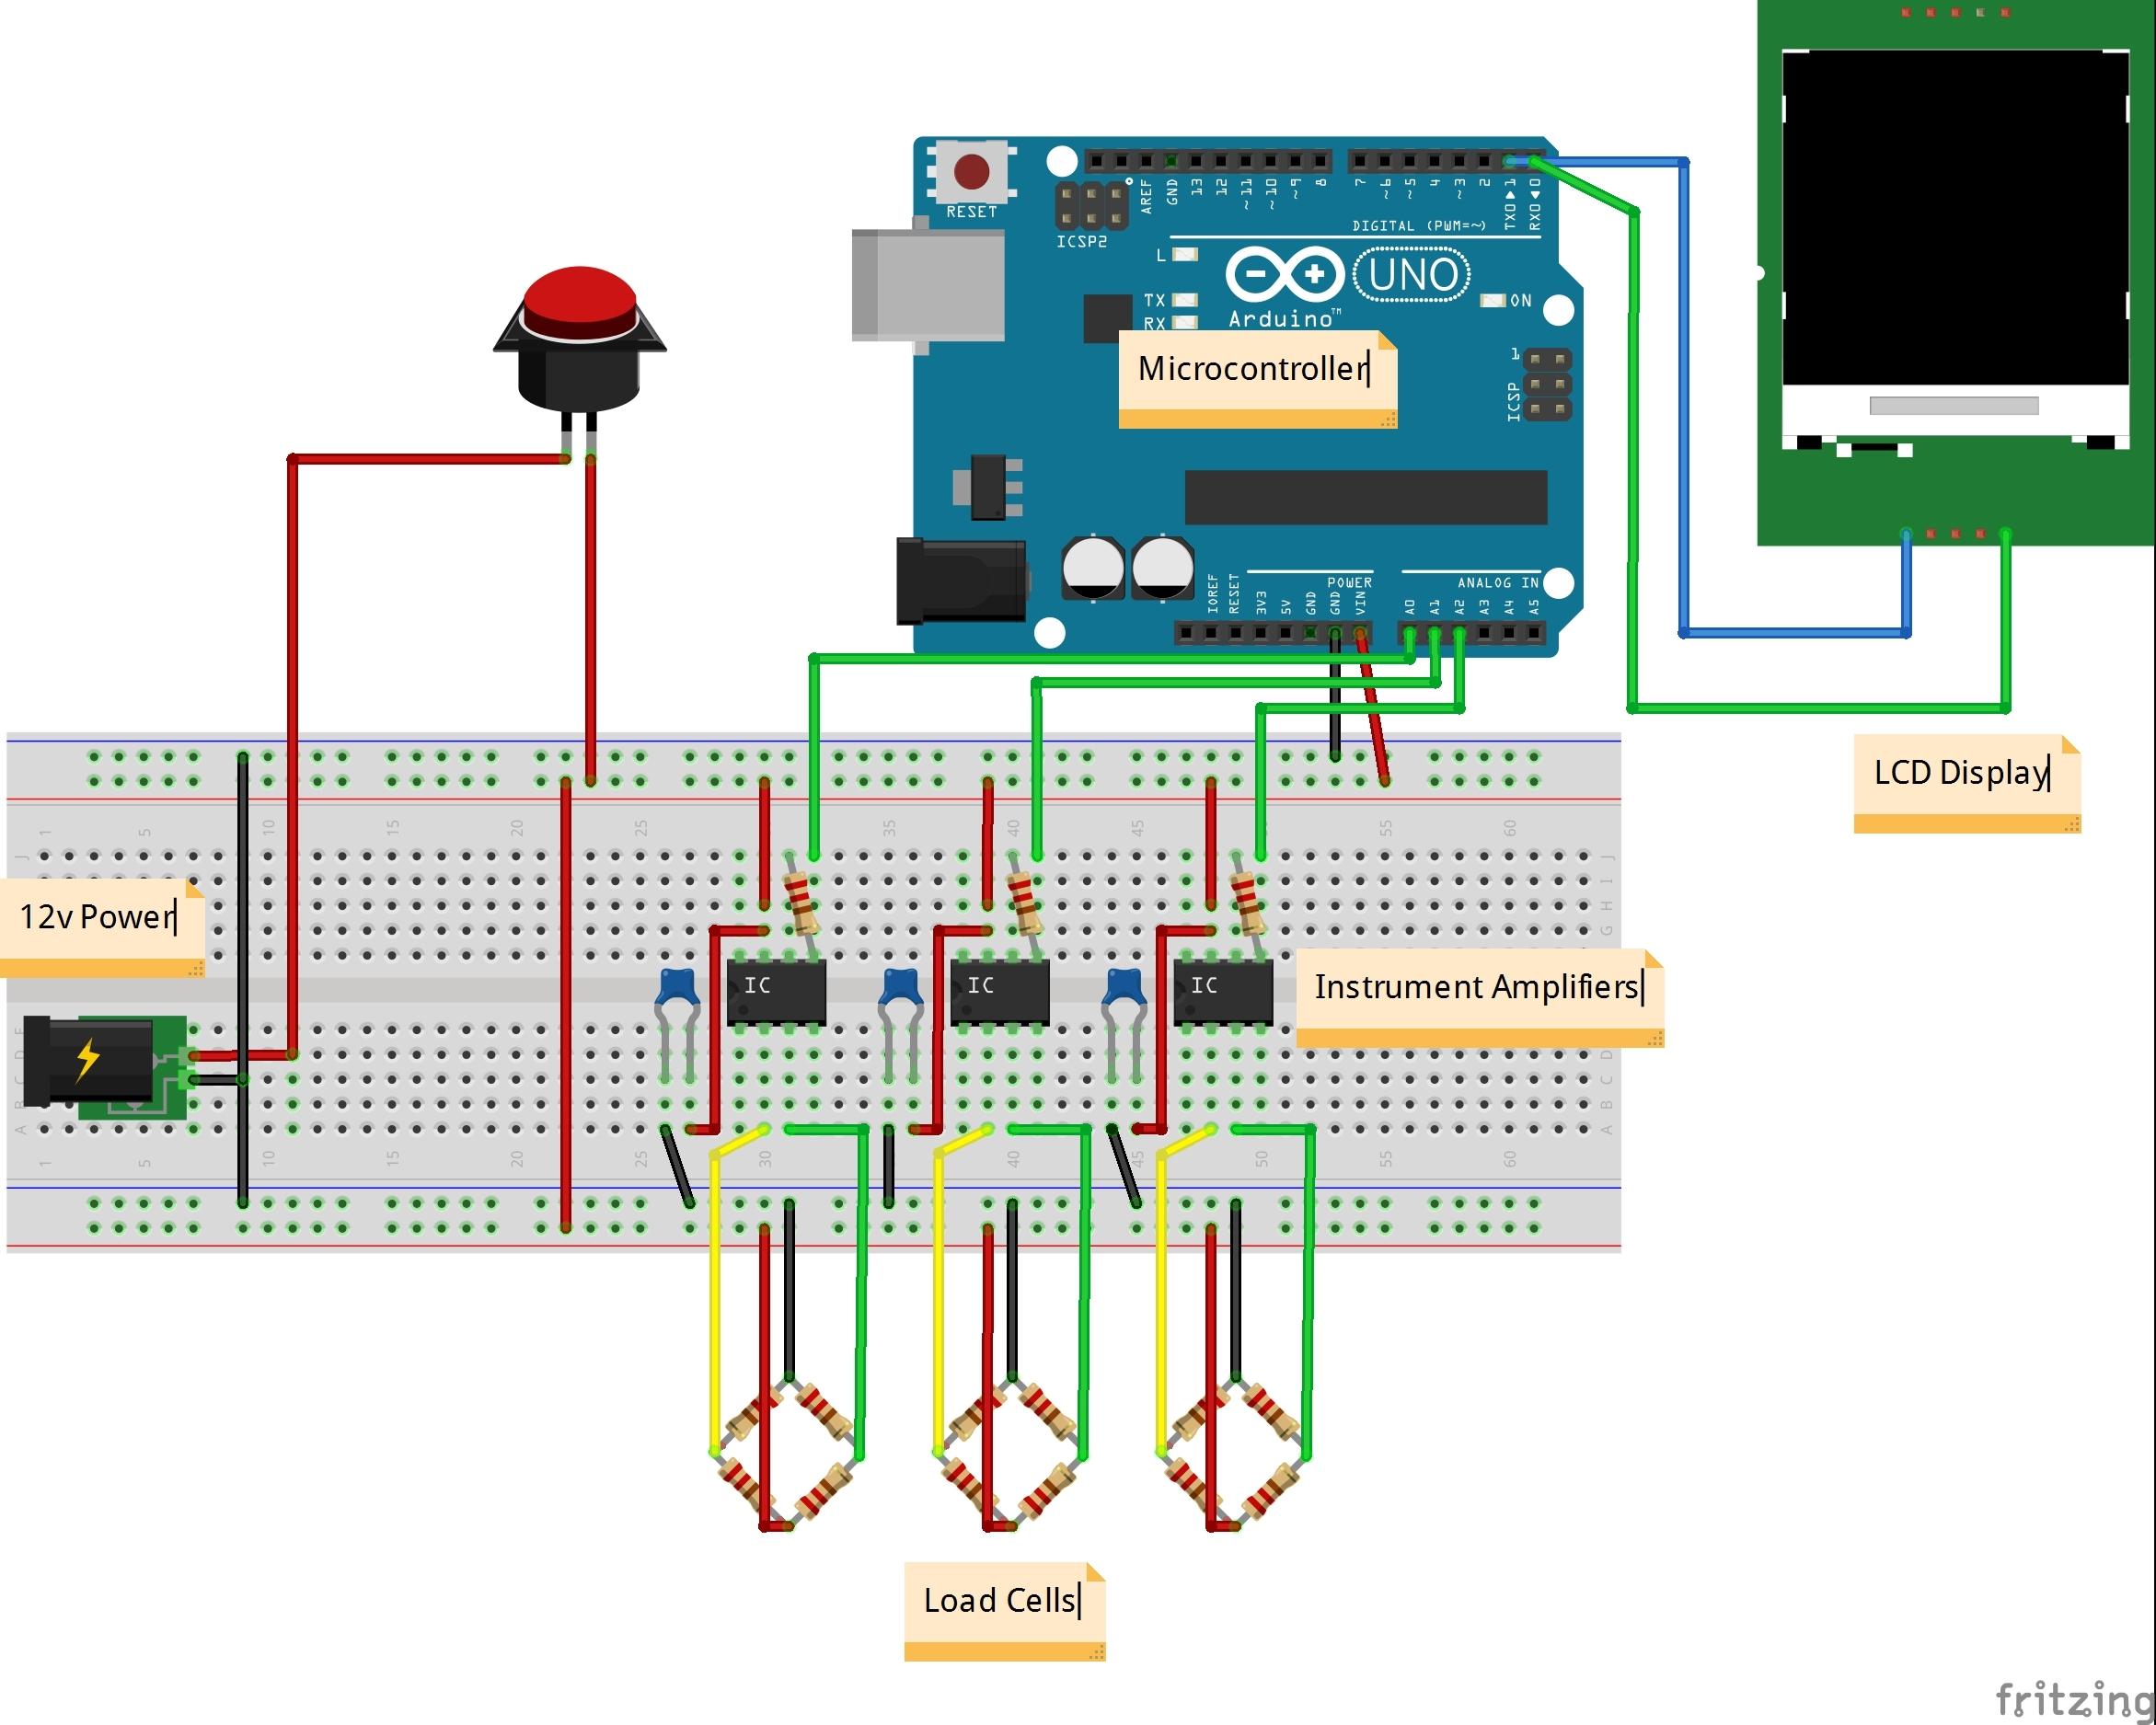 BMP085 Barometric Pressure/Temperature/Altitude Sensor